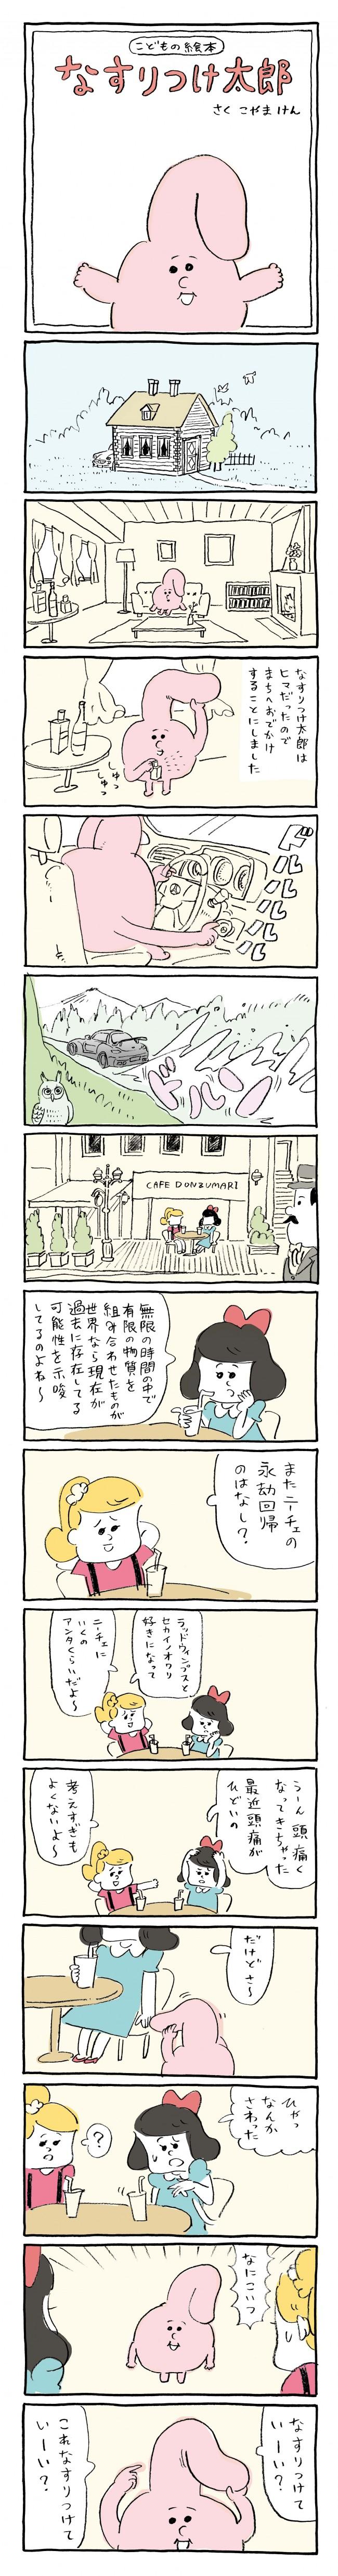 omocoro_manga_1_s